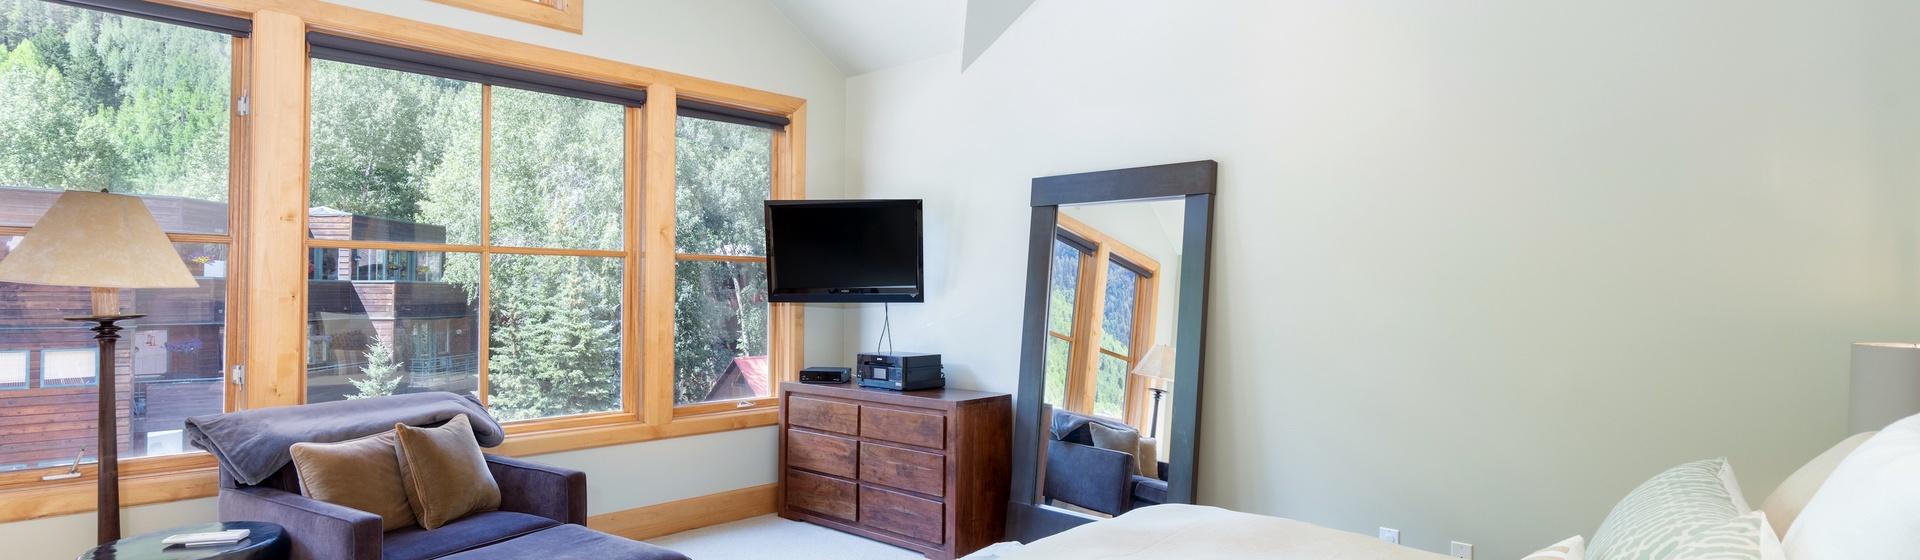 9.1-Telluride-Pine-Street-Penthouse-A-Secondary-Suite